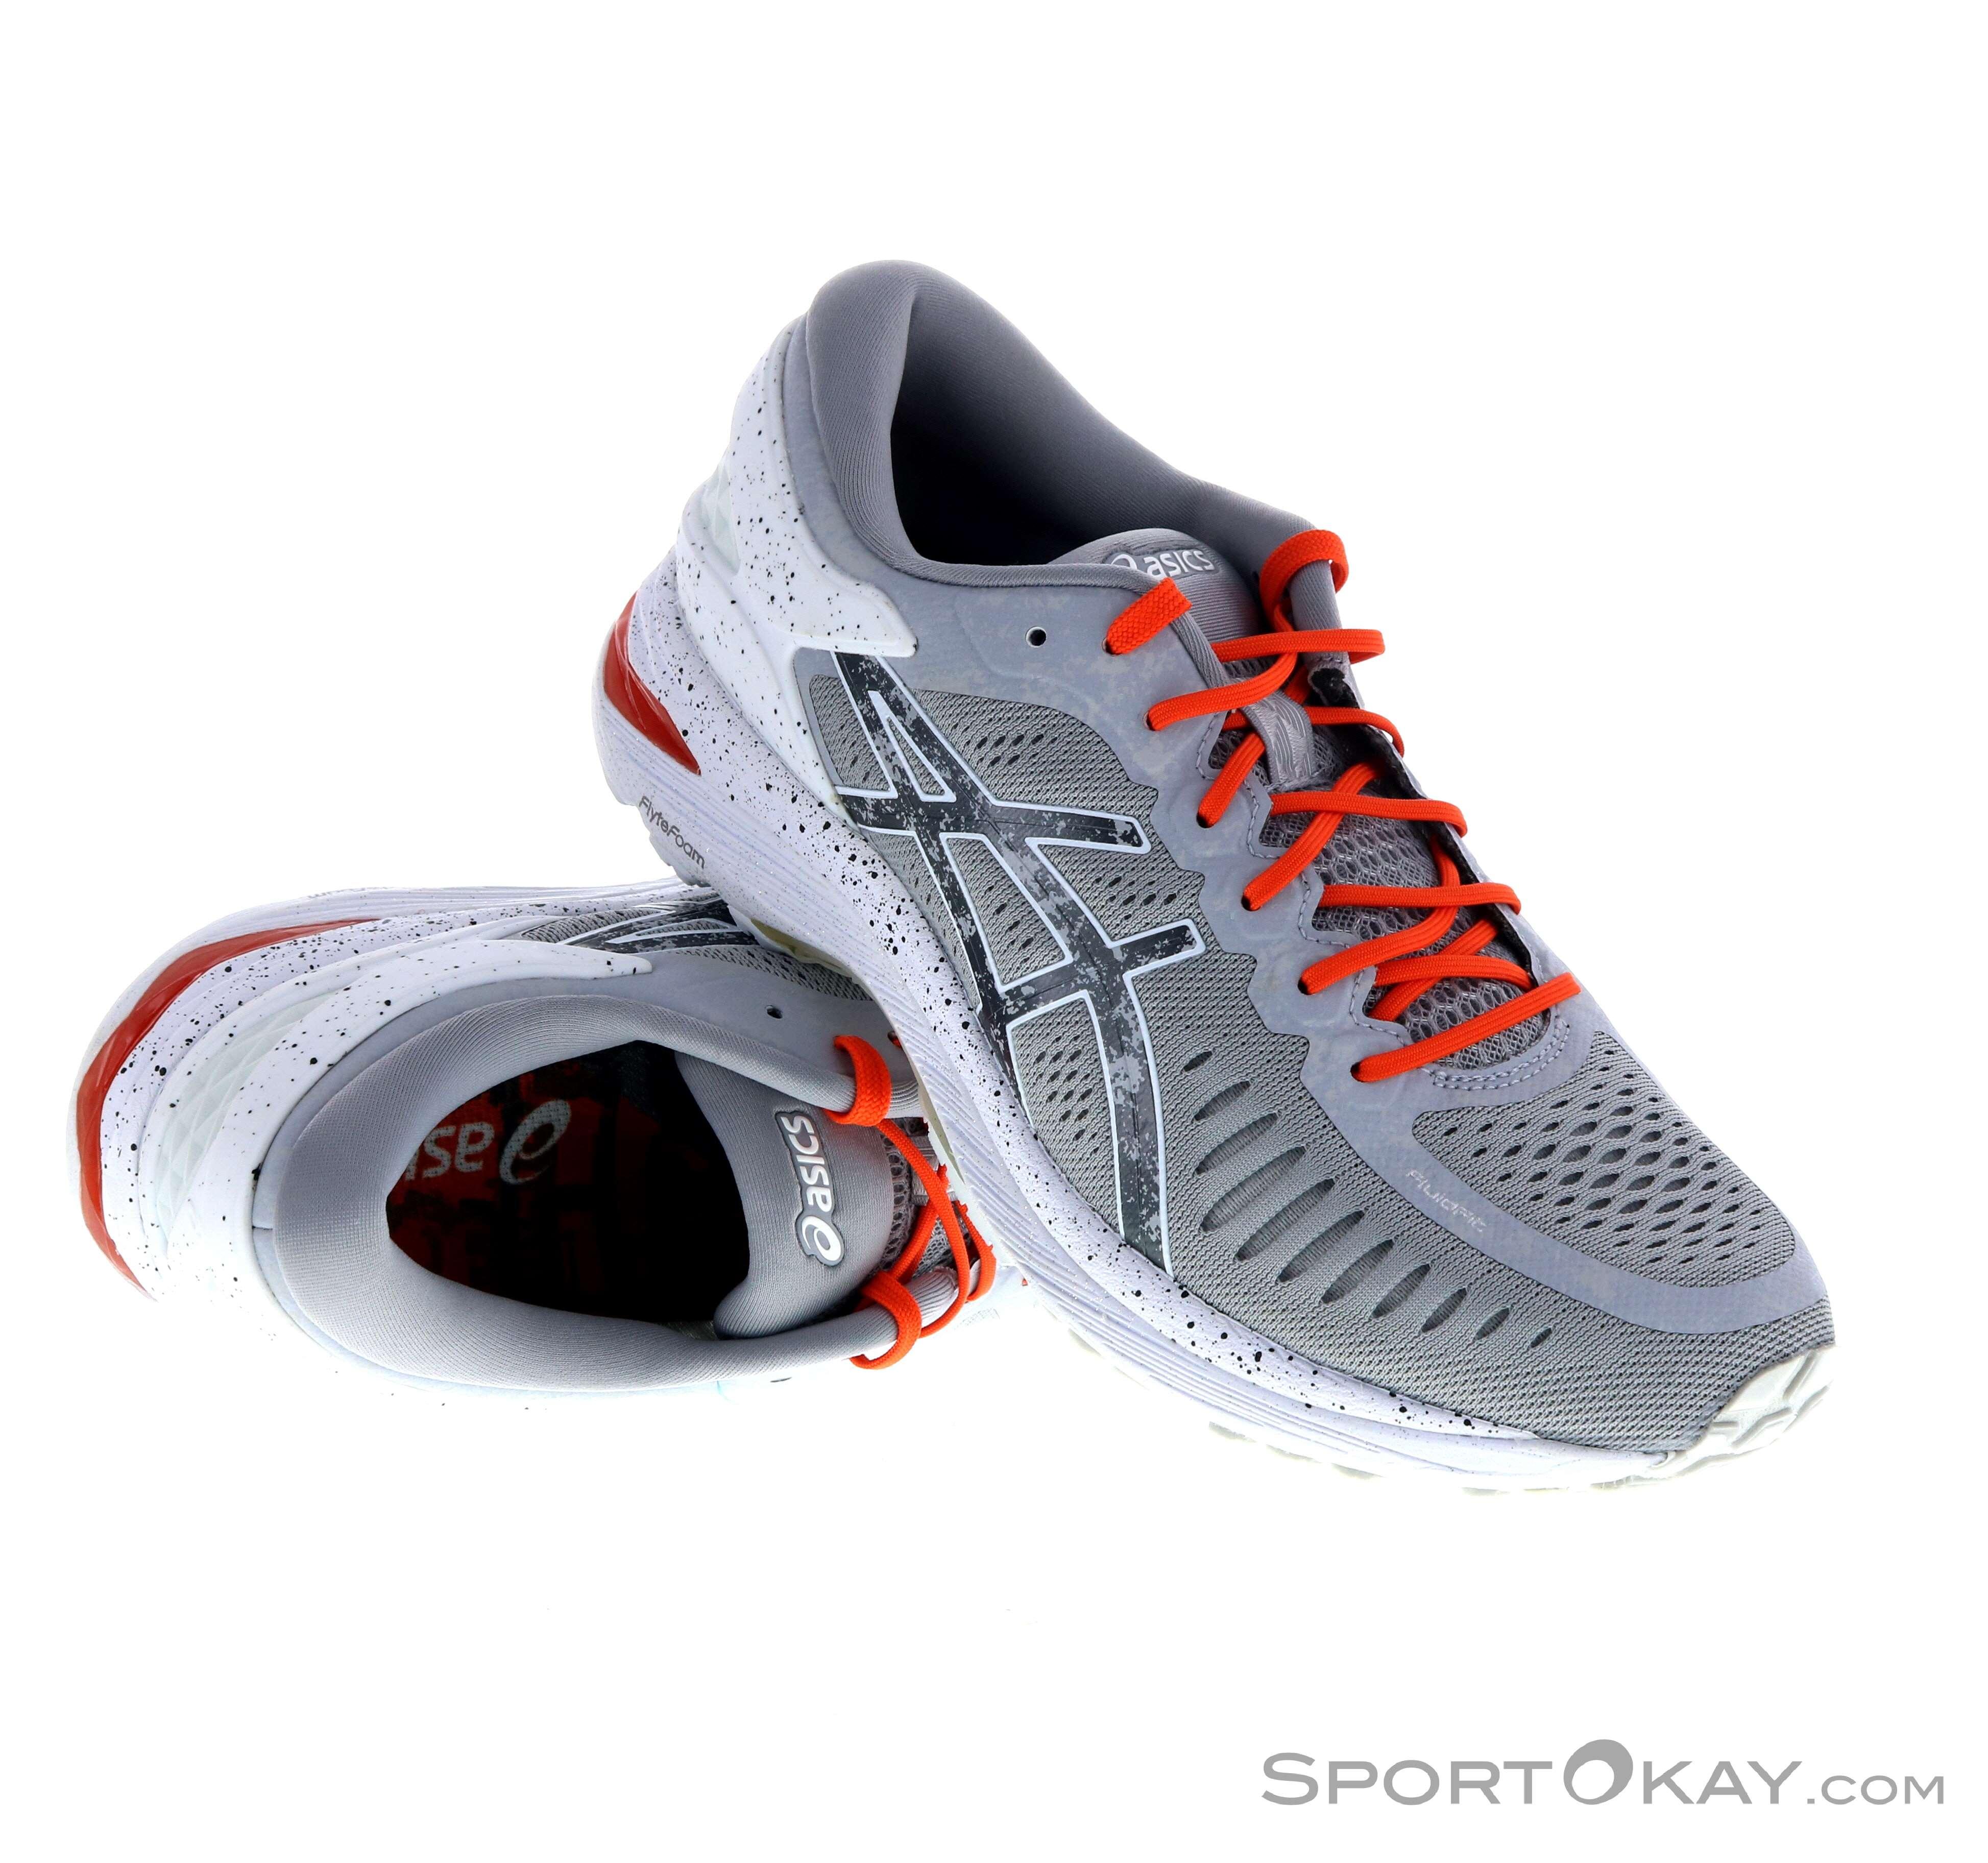 Asics Asics Metarun Womens Running Shoes